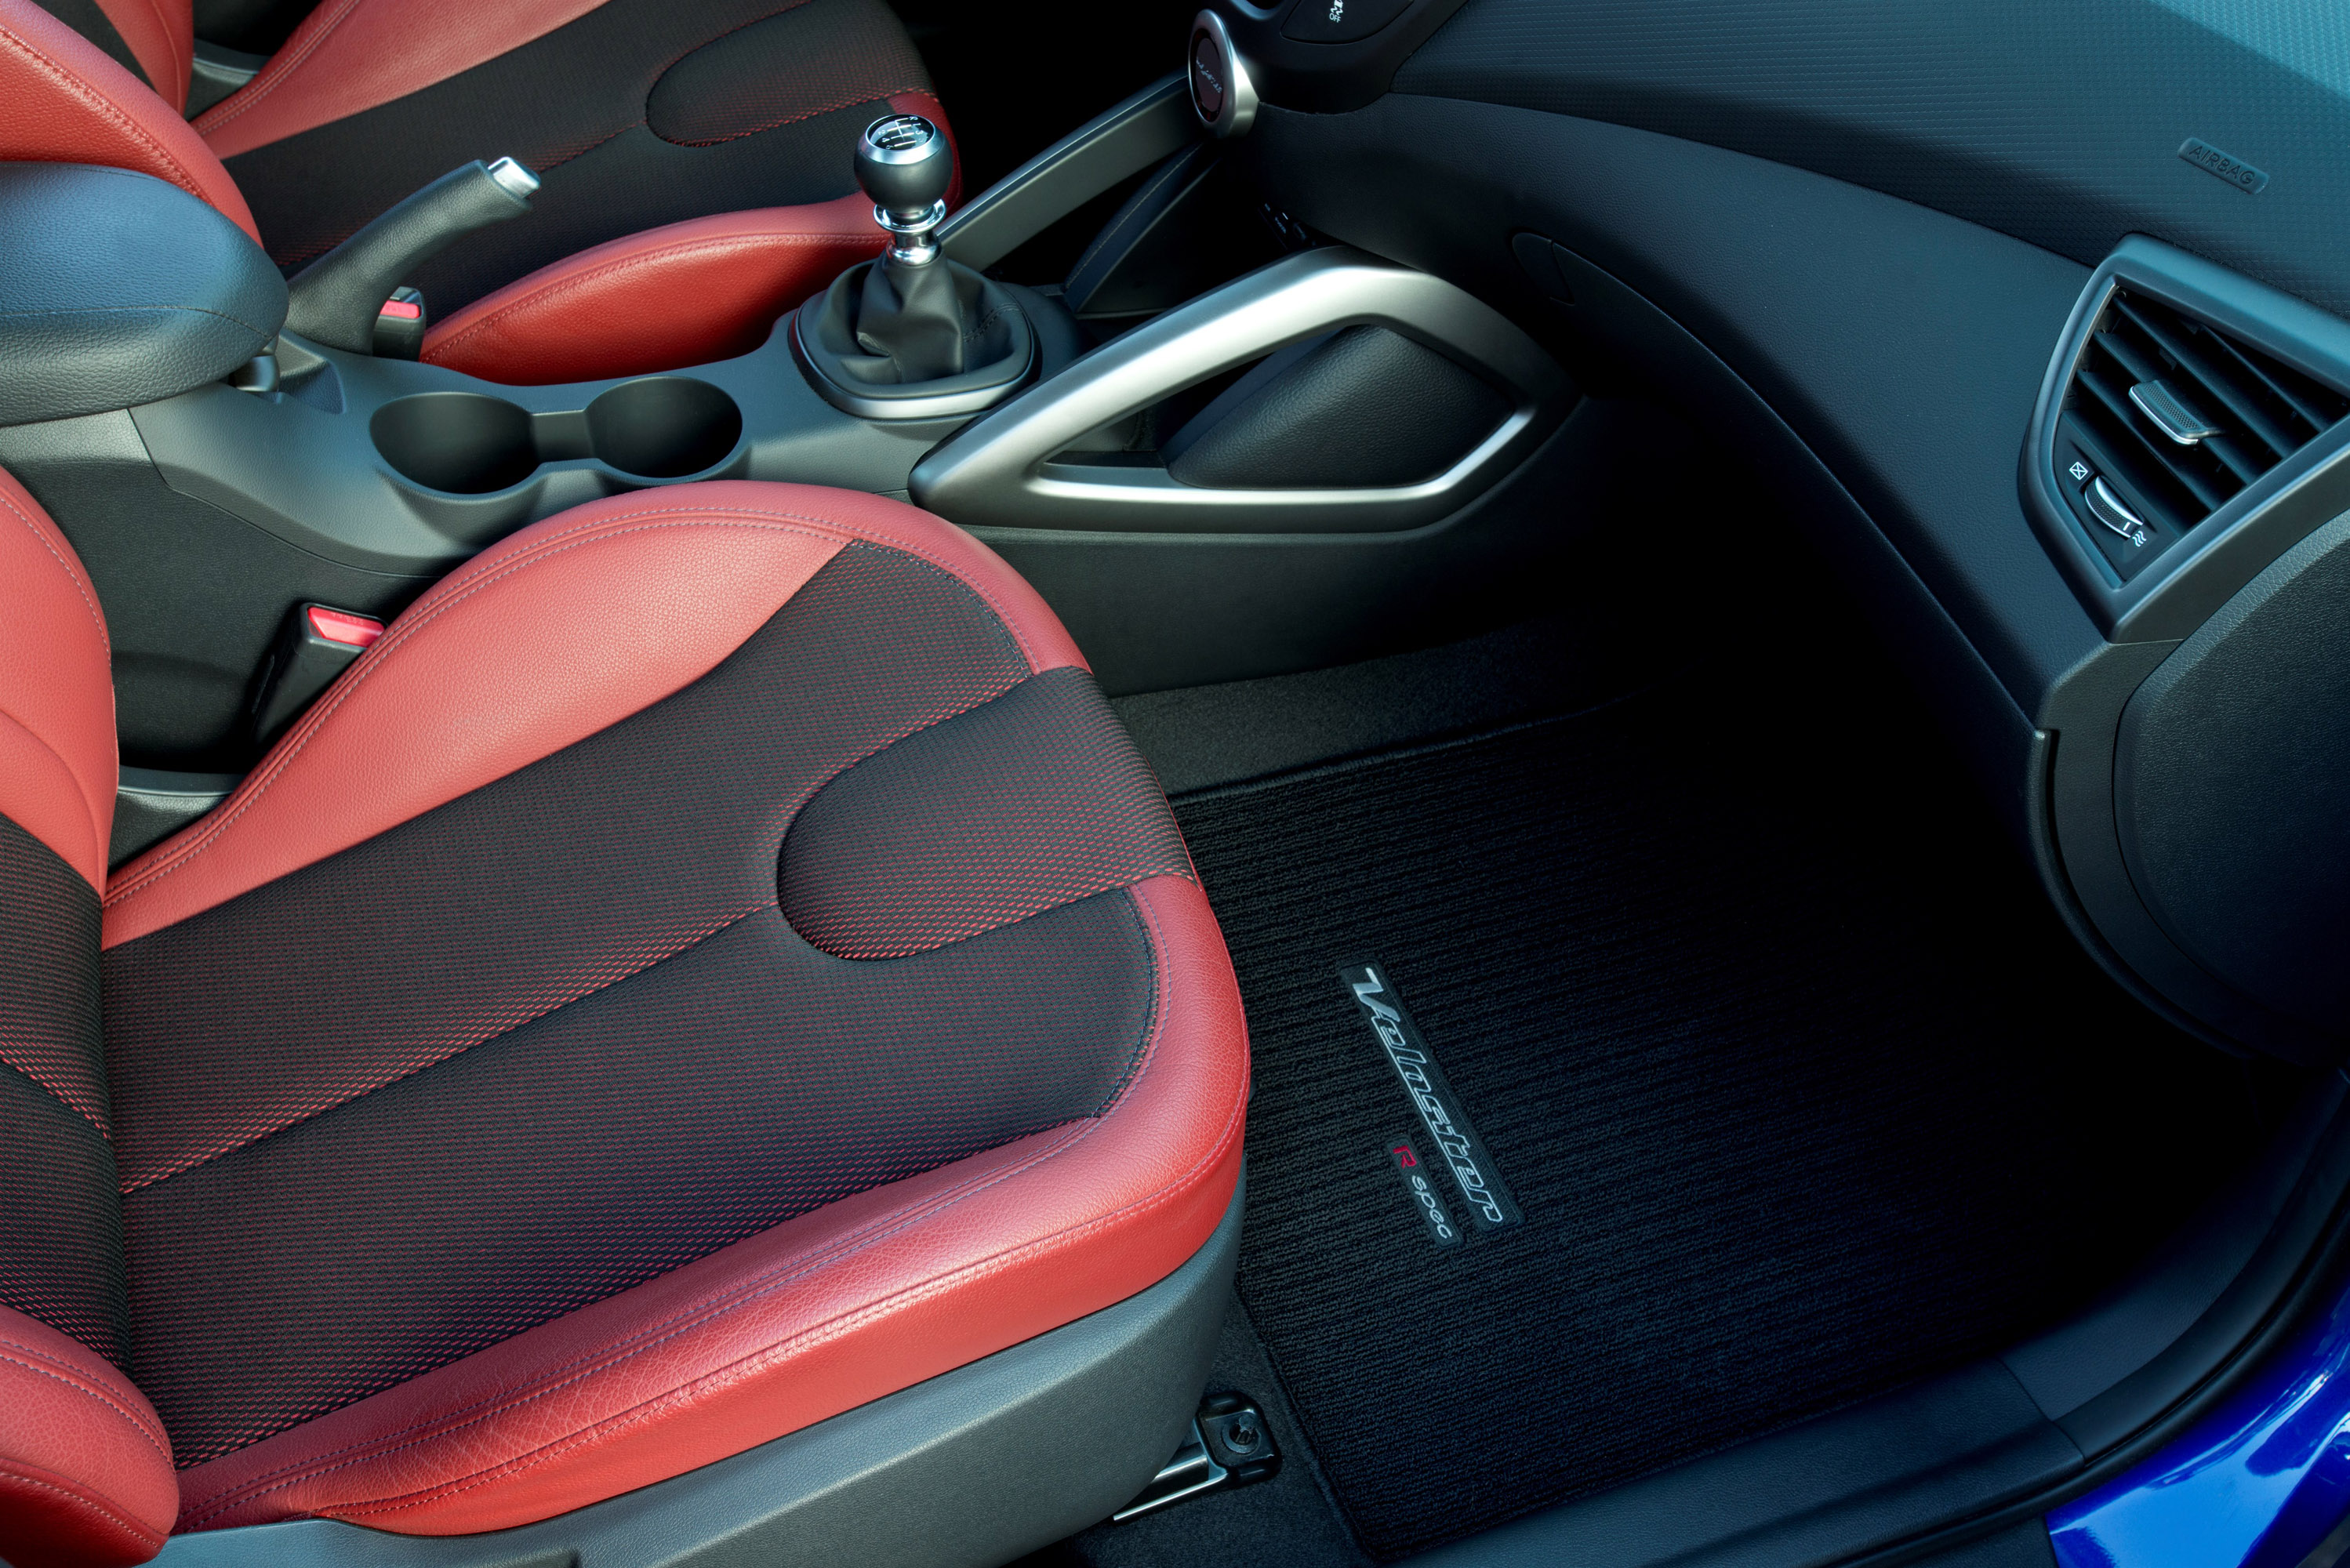 Hyundai Veloster Turbo R-Spec photo #29